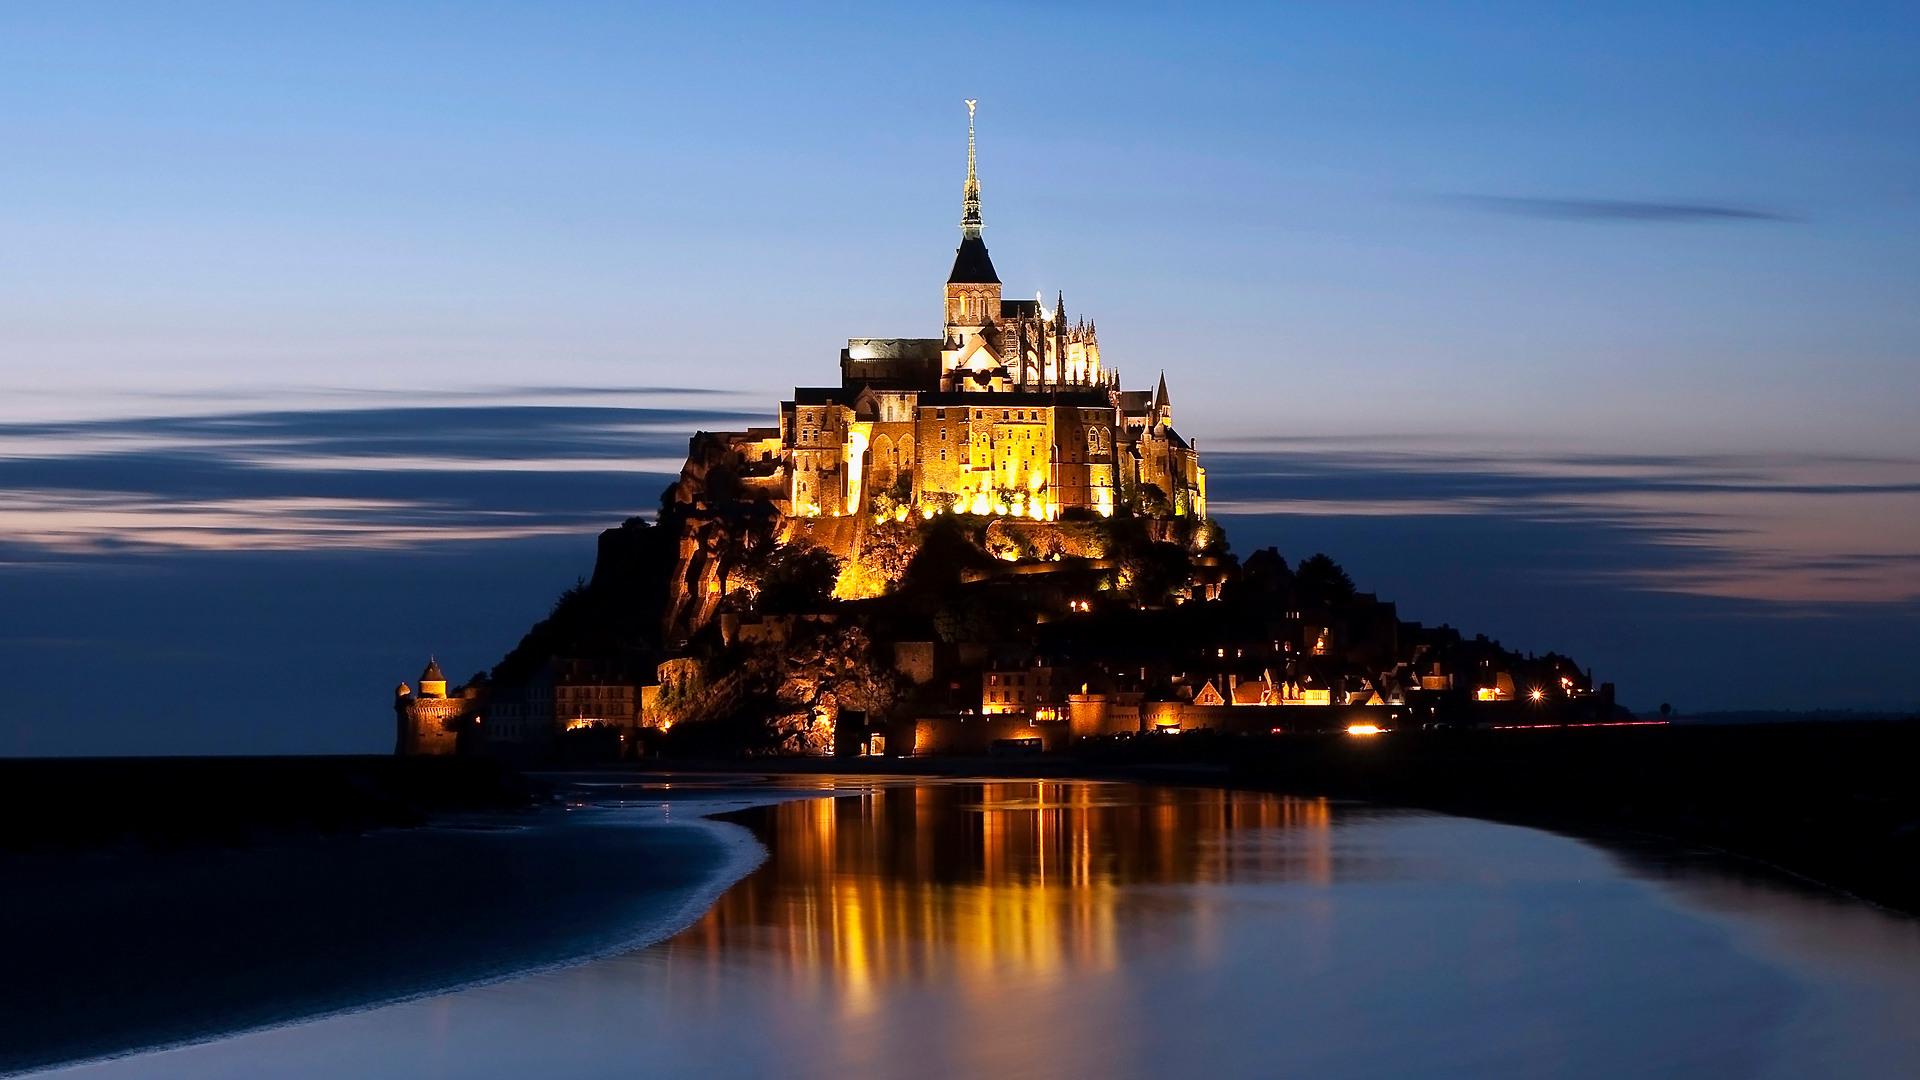 cosas que hacer en francia, francia, france, paris, cosas que hacer en paris, louvre, francia, costa azul, mont saint-michel, cosas que hacer, turismo, tourism